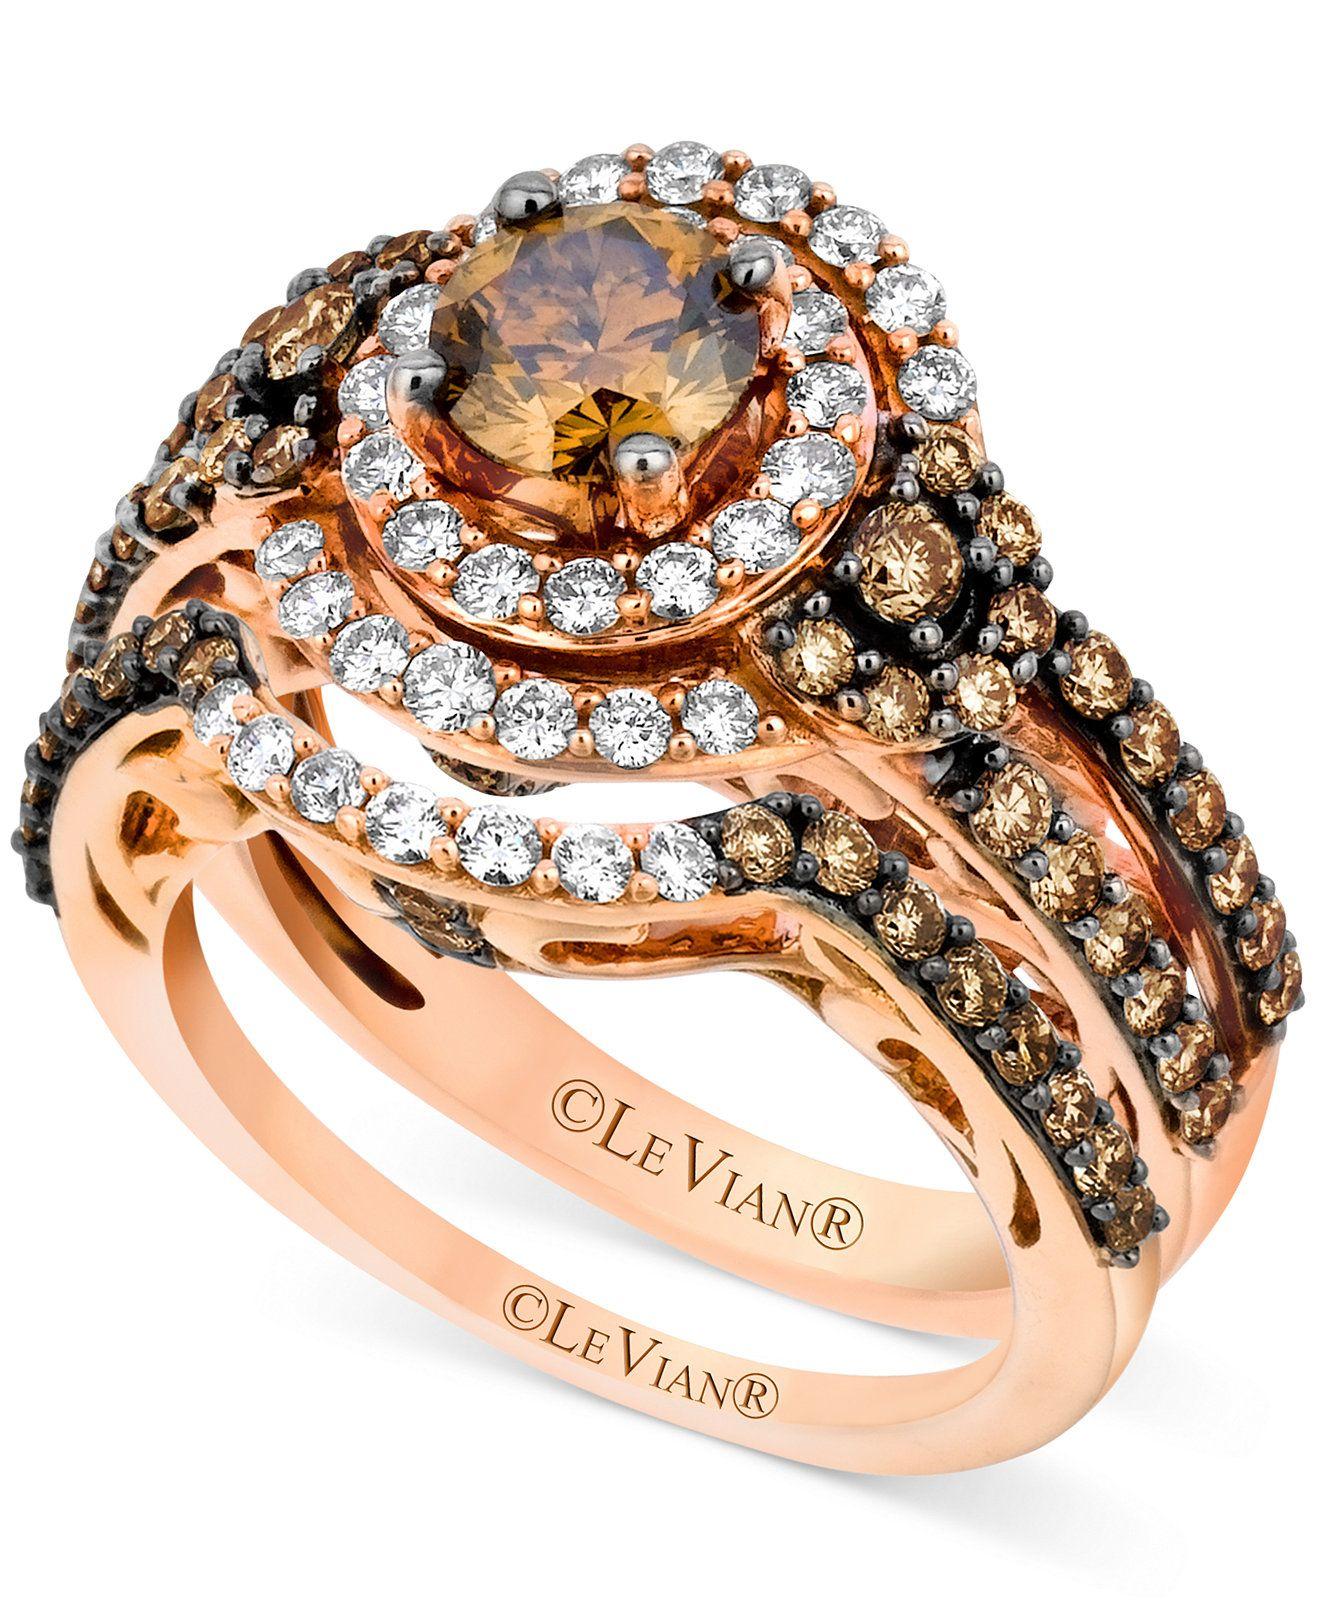 Le Vian Bridal Set Chocolate Diamond 1 3 4 ct t w and White